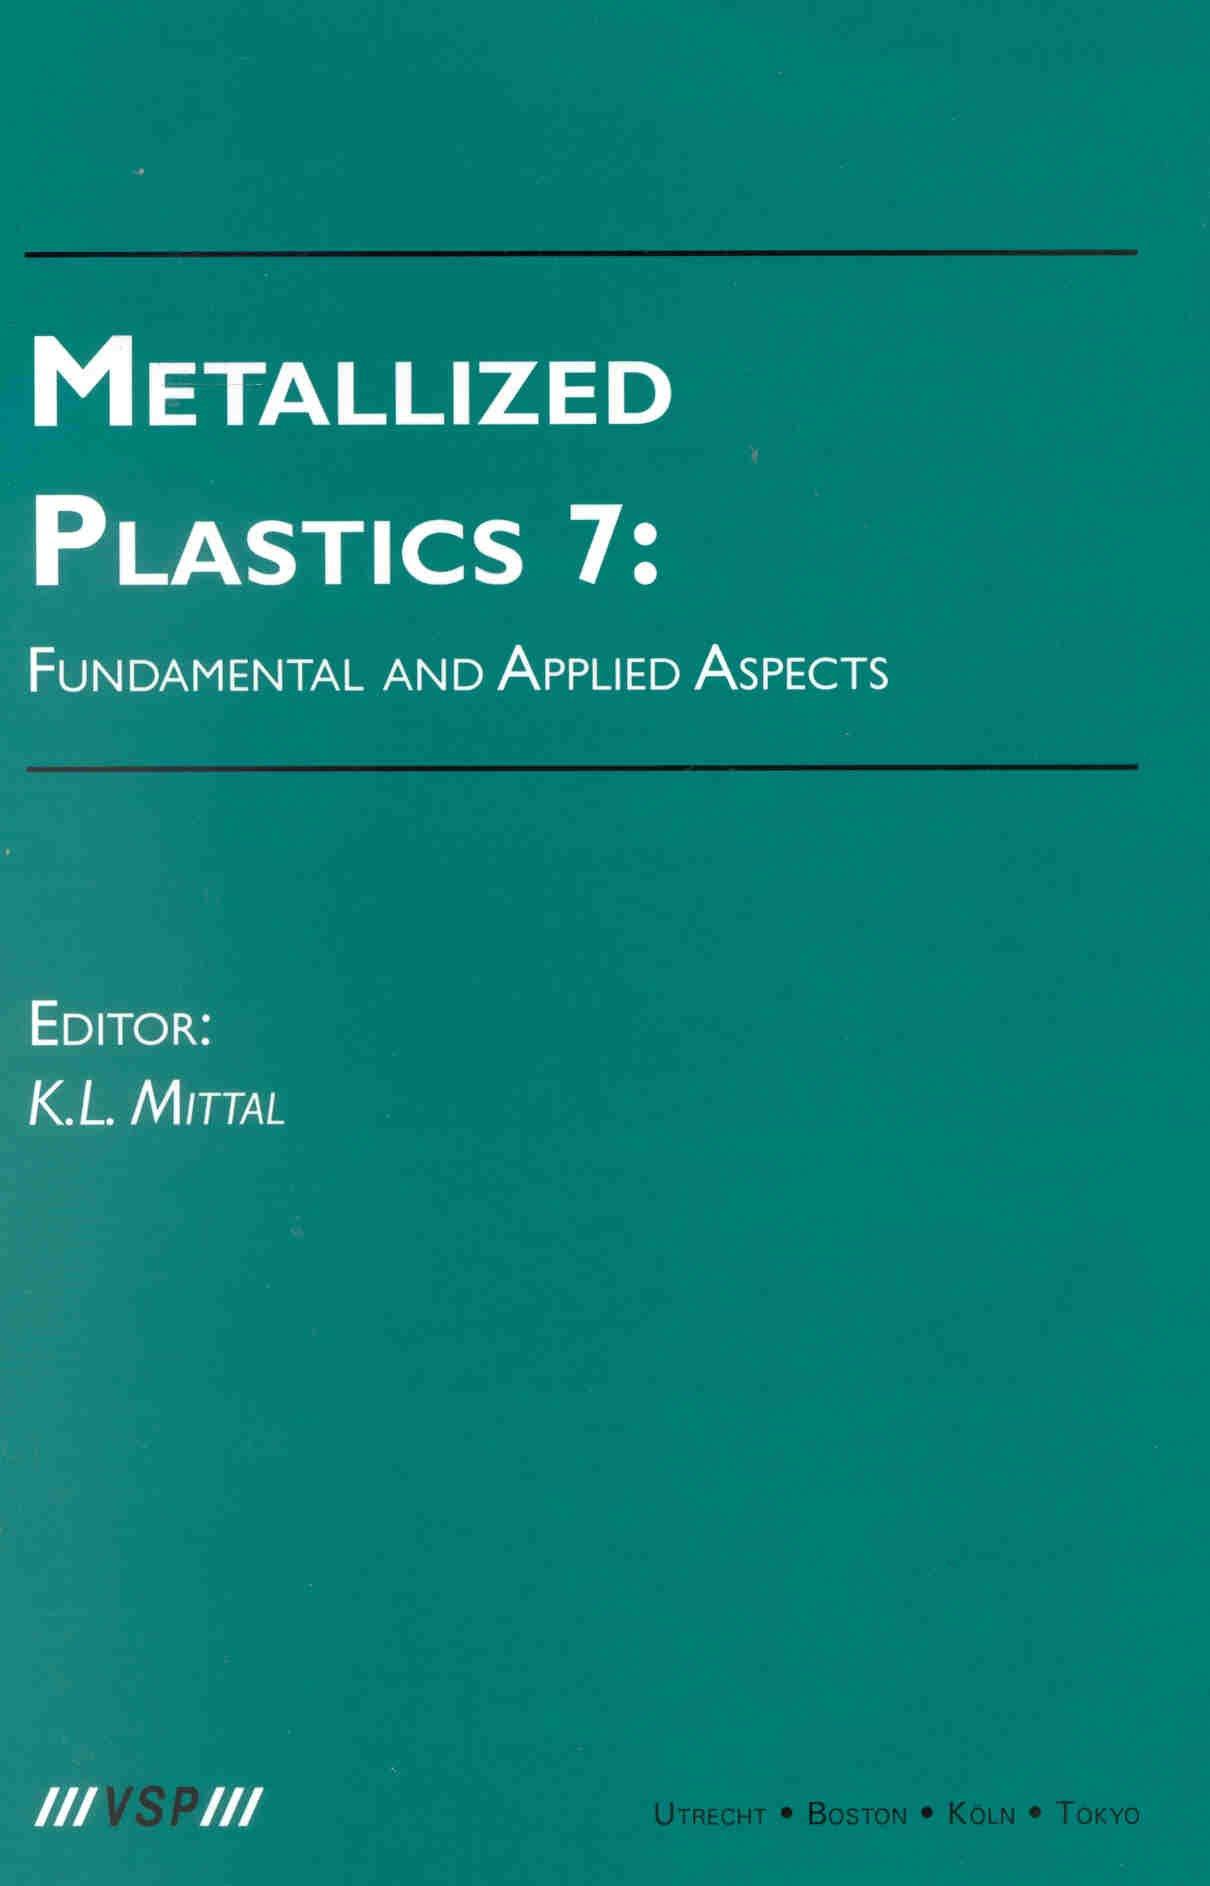 Download Metallized Plastics 7: Fundamental and Applied Aspects PDF